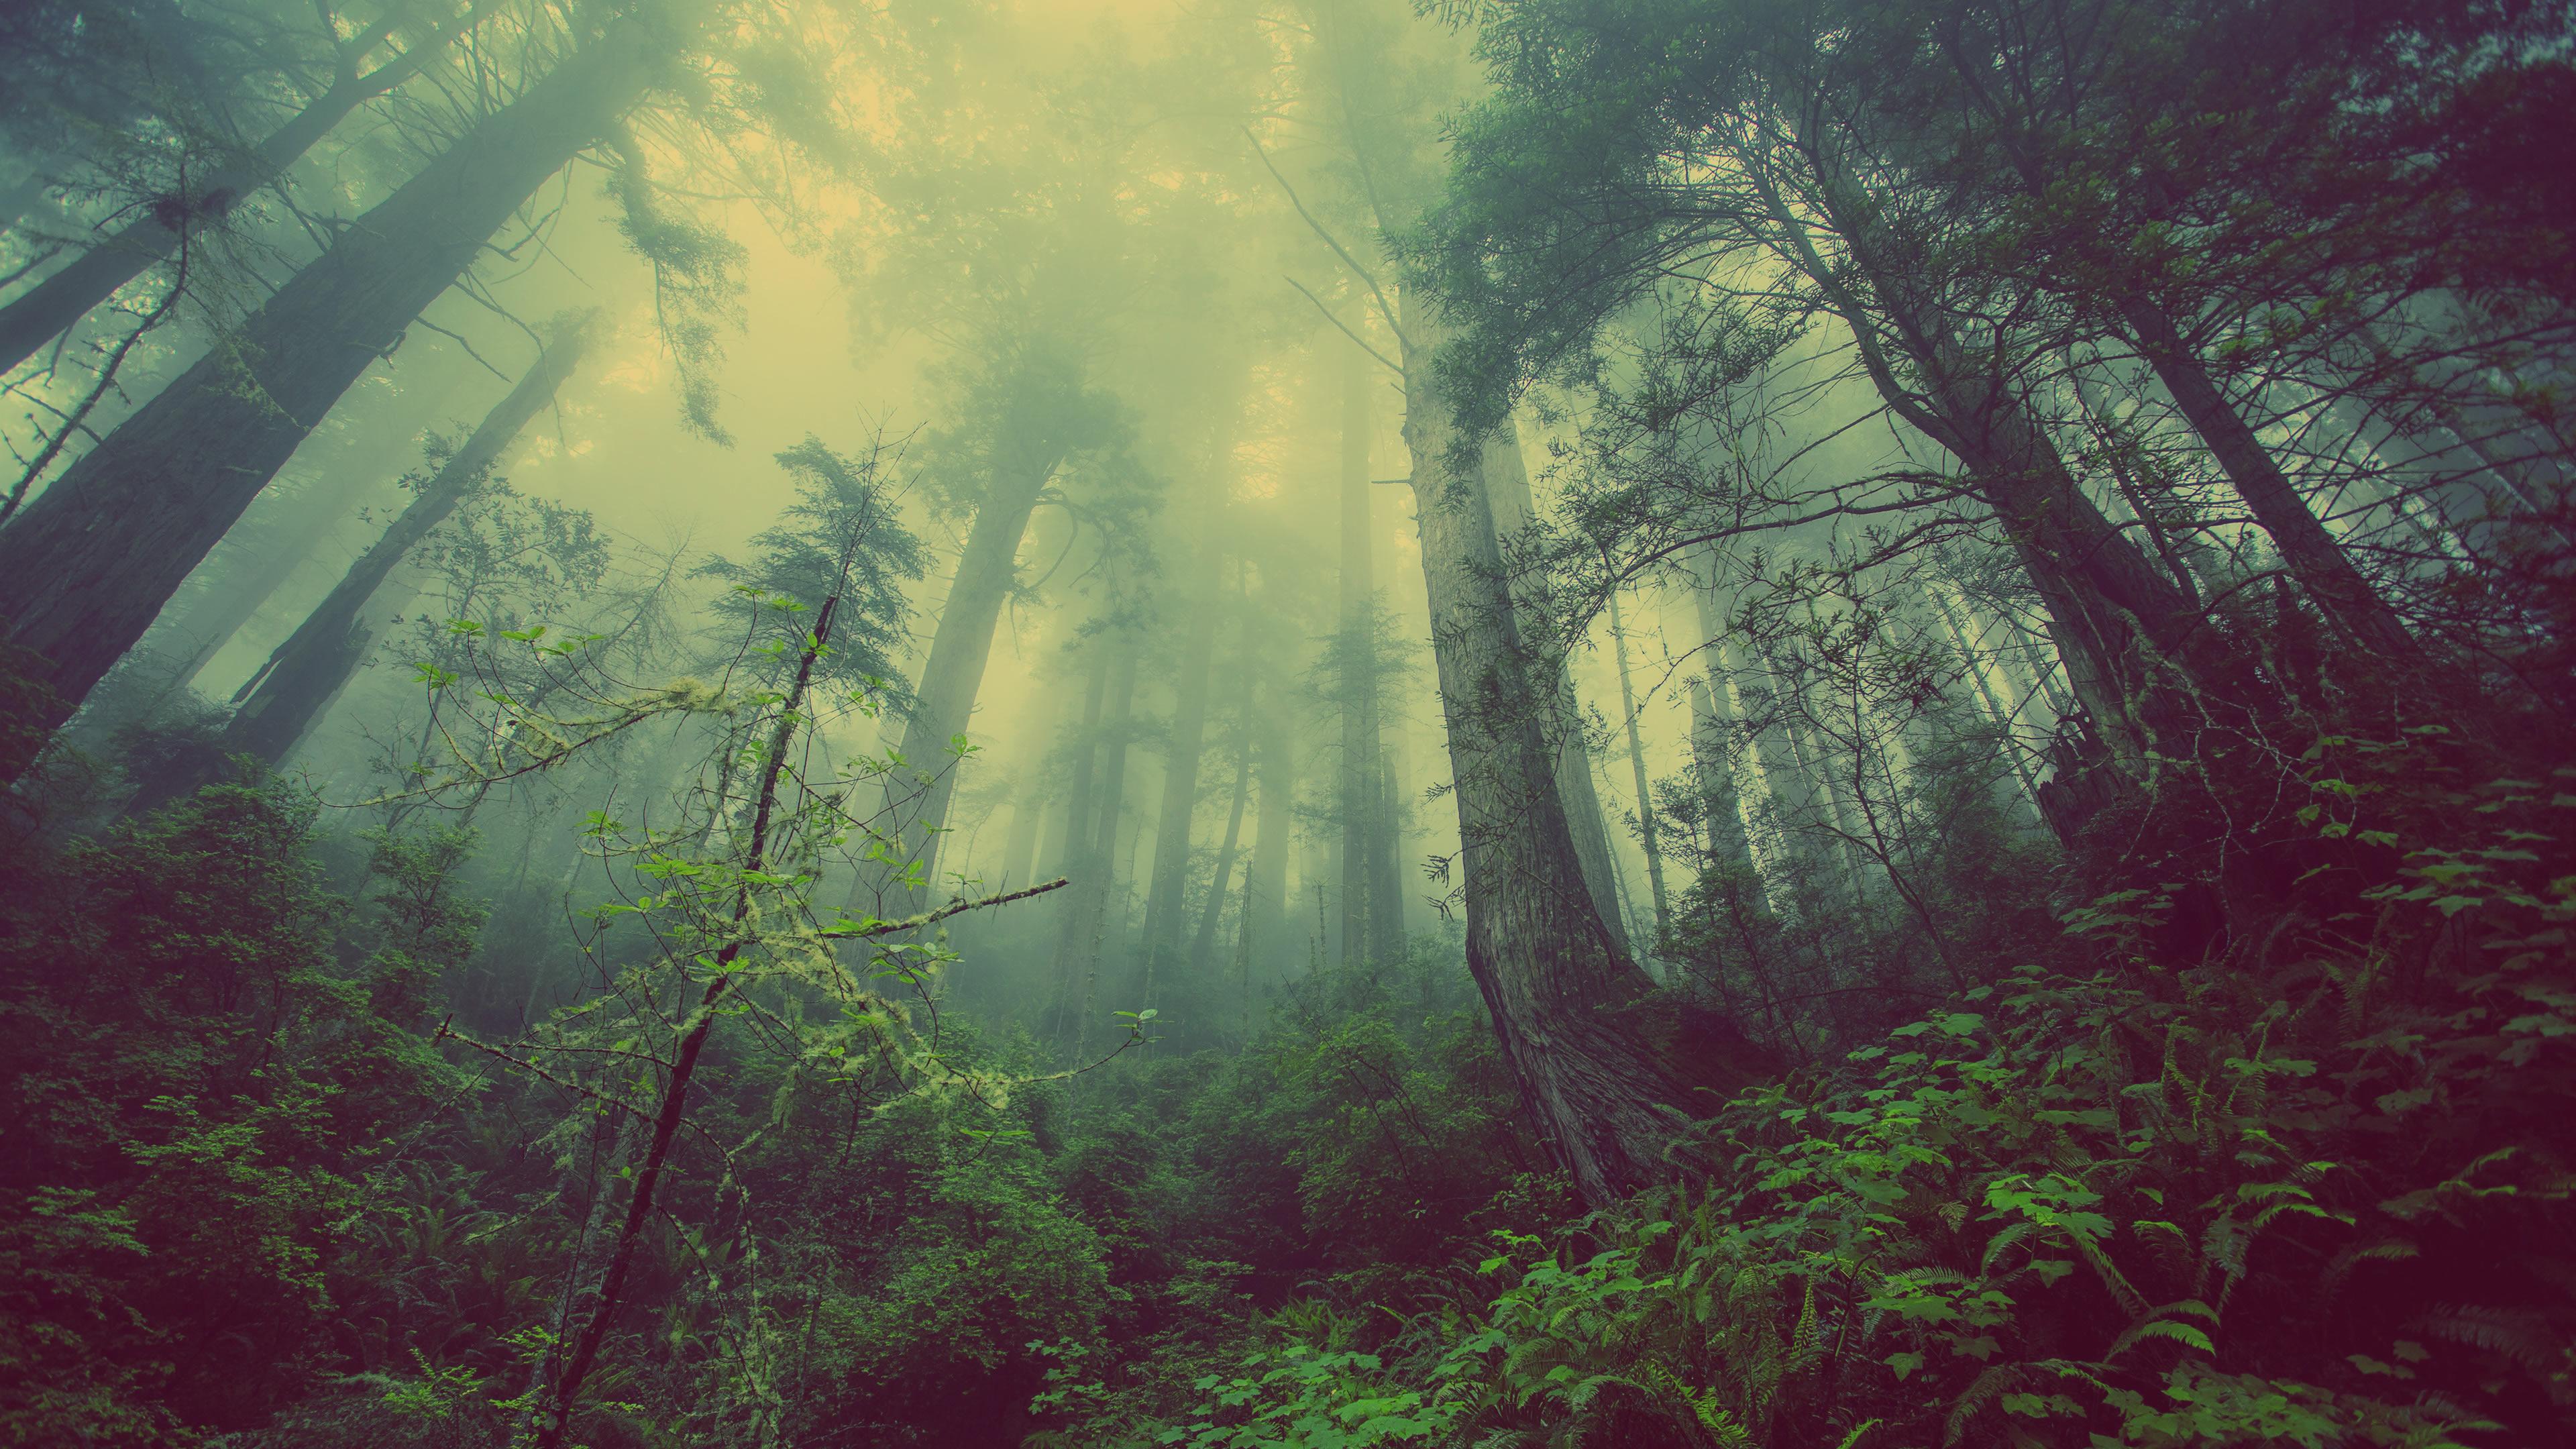 Theme Bin Blog Archive Desolate Forest 4K Wallpaper 3840x2160